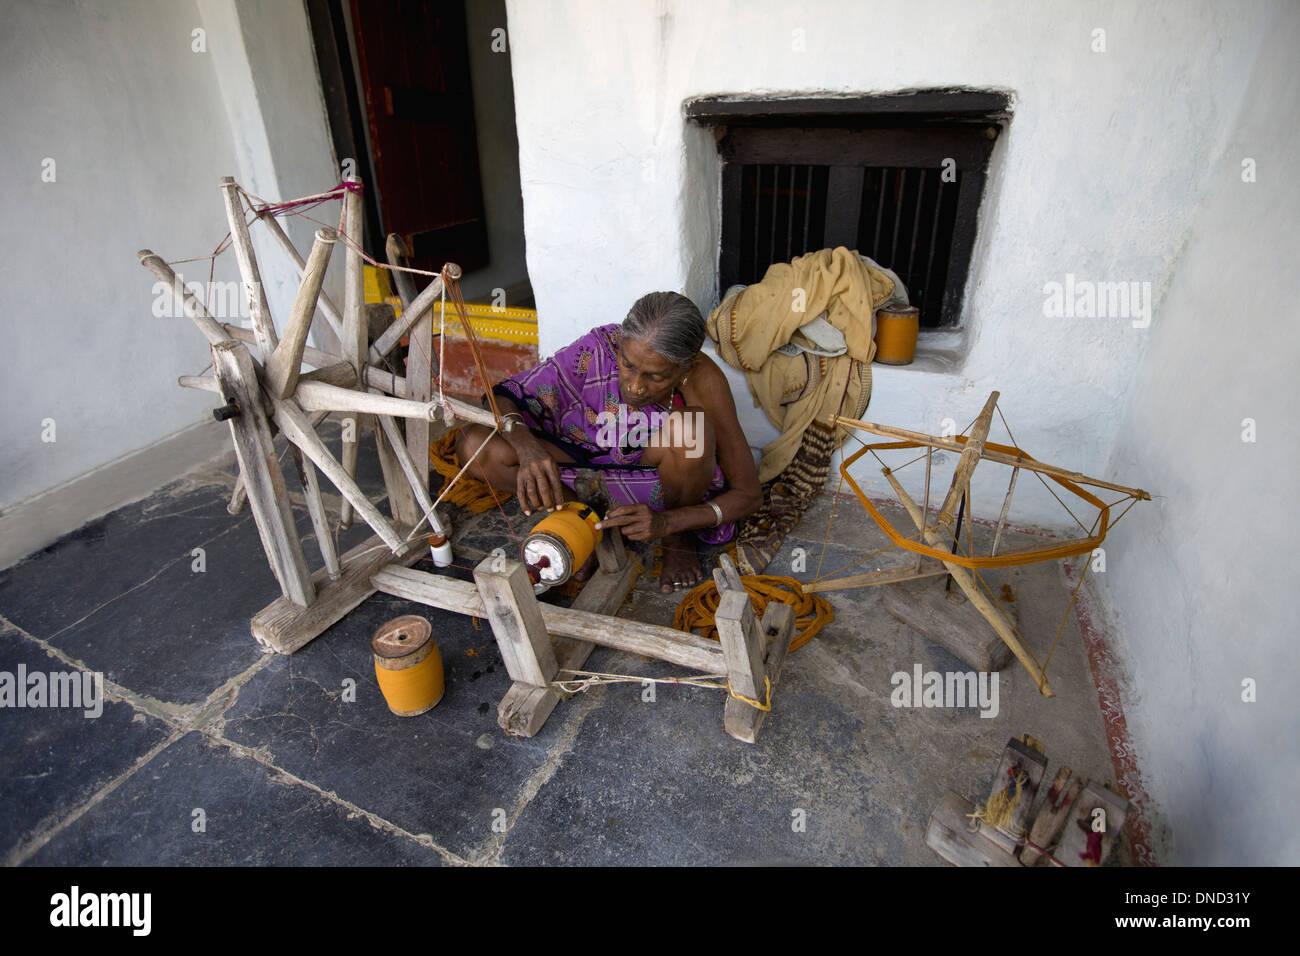 Tribal woman making thread on Charkha, the spinning wheel